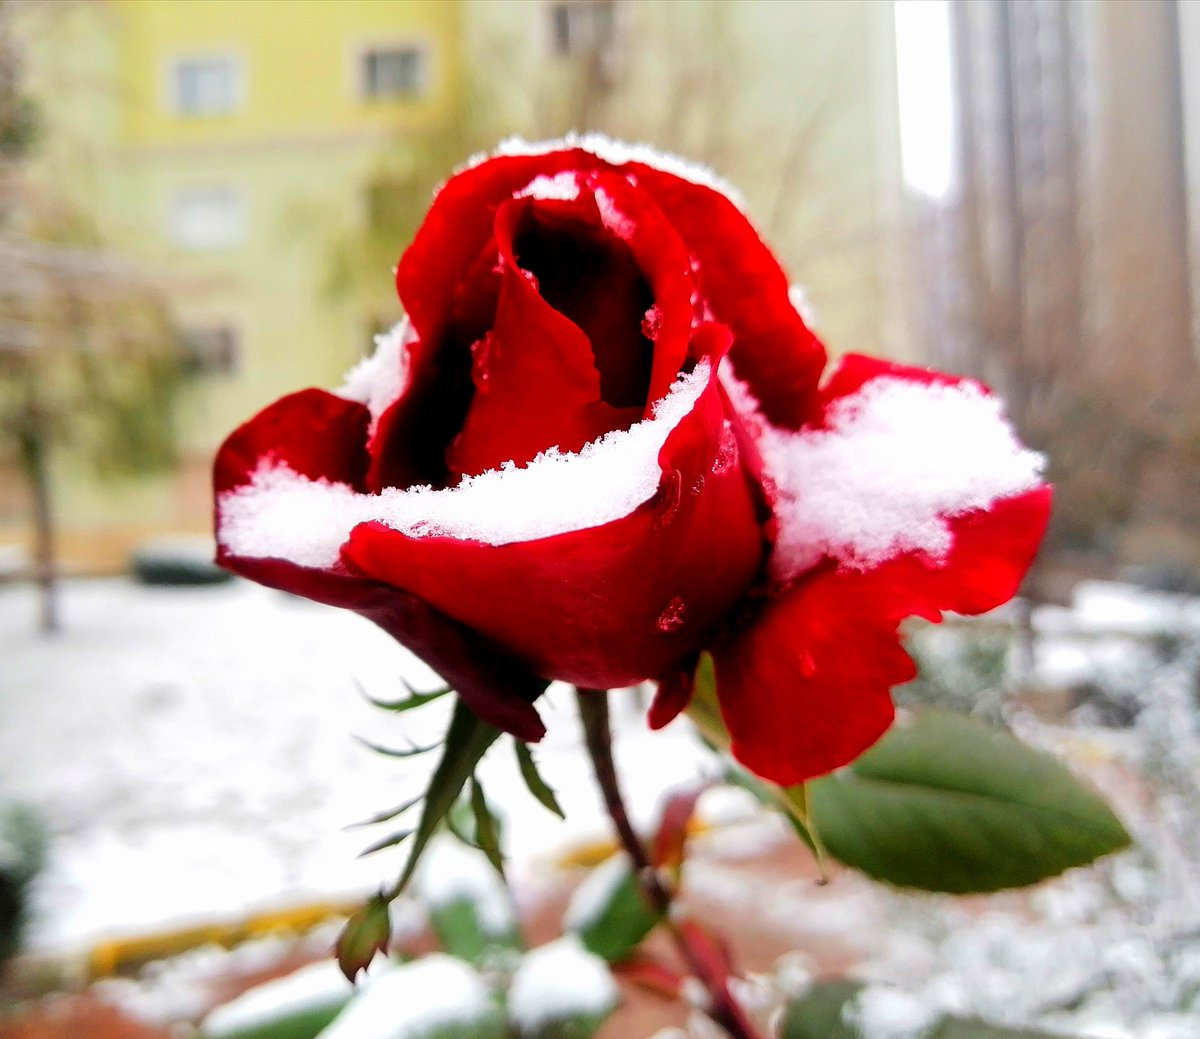 Still resisting...  #nature #istanbuldakaryağıyor #NaturePhotography #photography #pazar #MutluPazarlar #Mobile #huawei #roses #sundayvibes